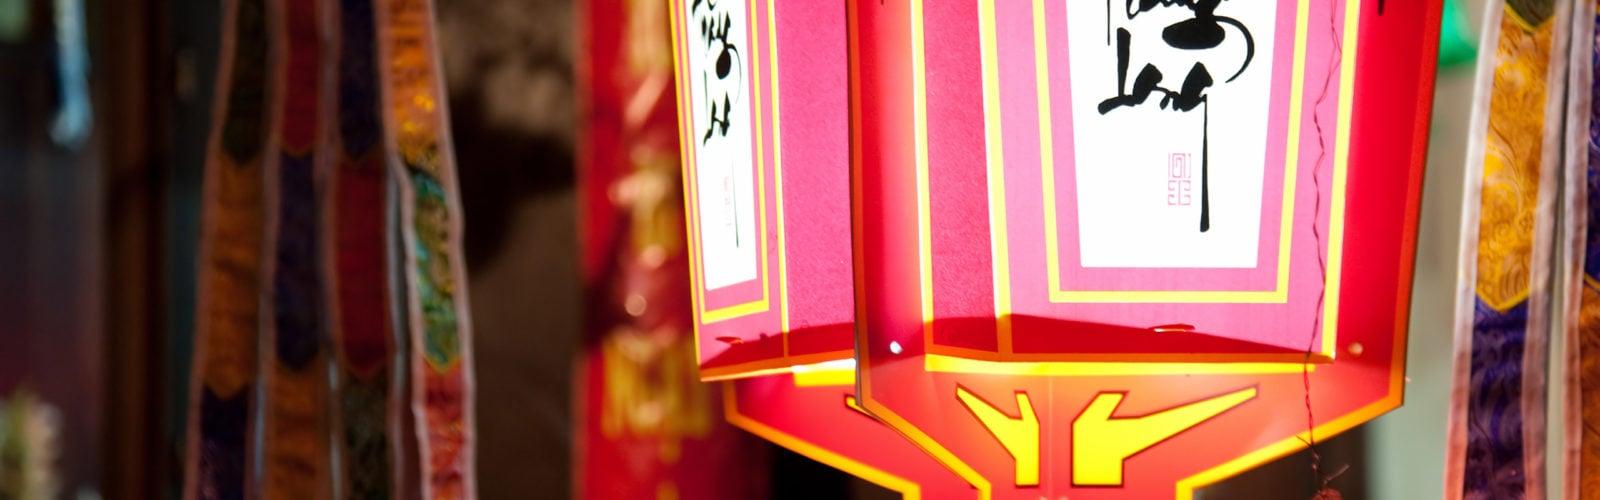 hanoi-lantern